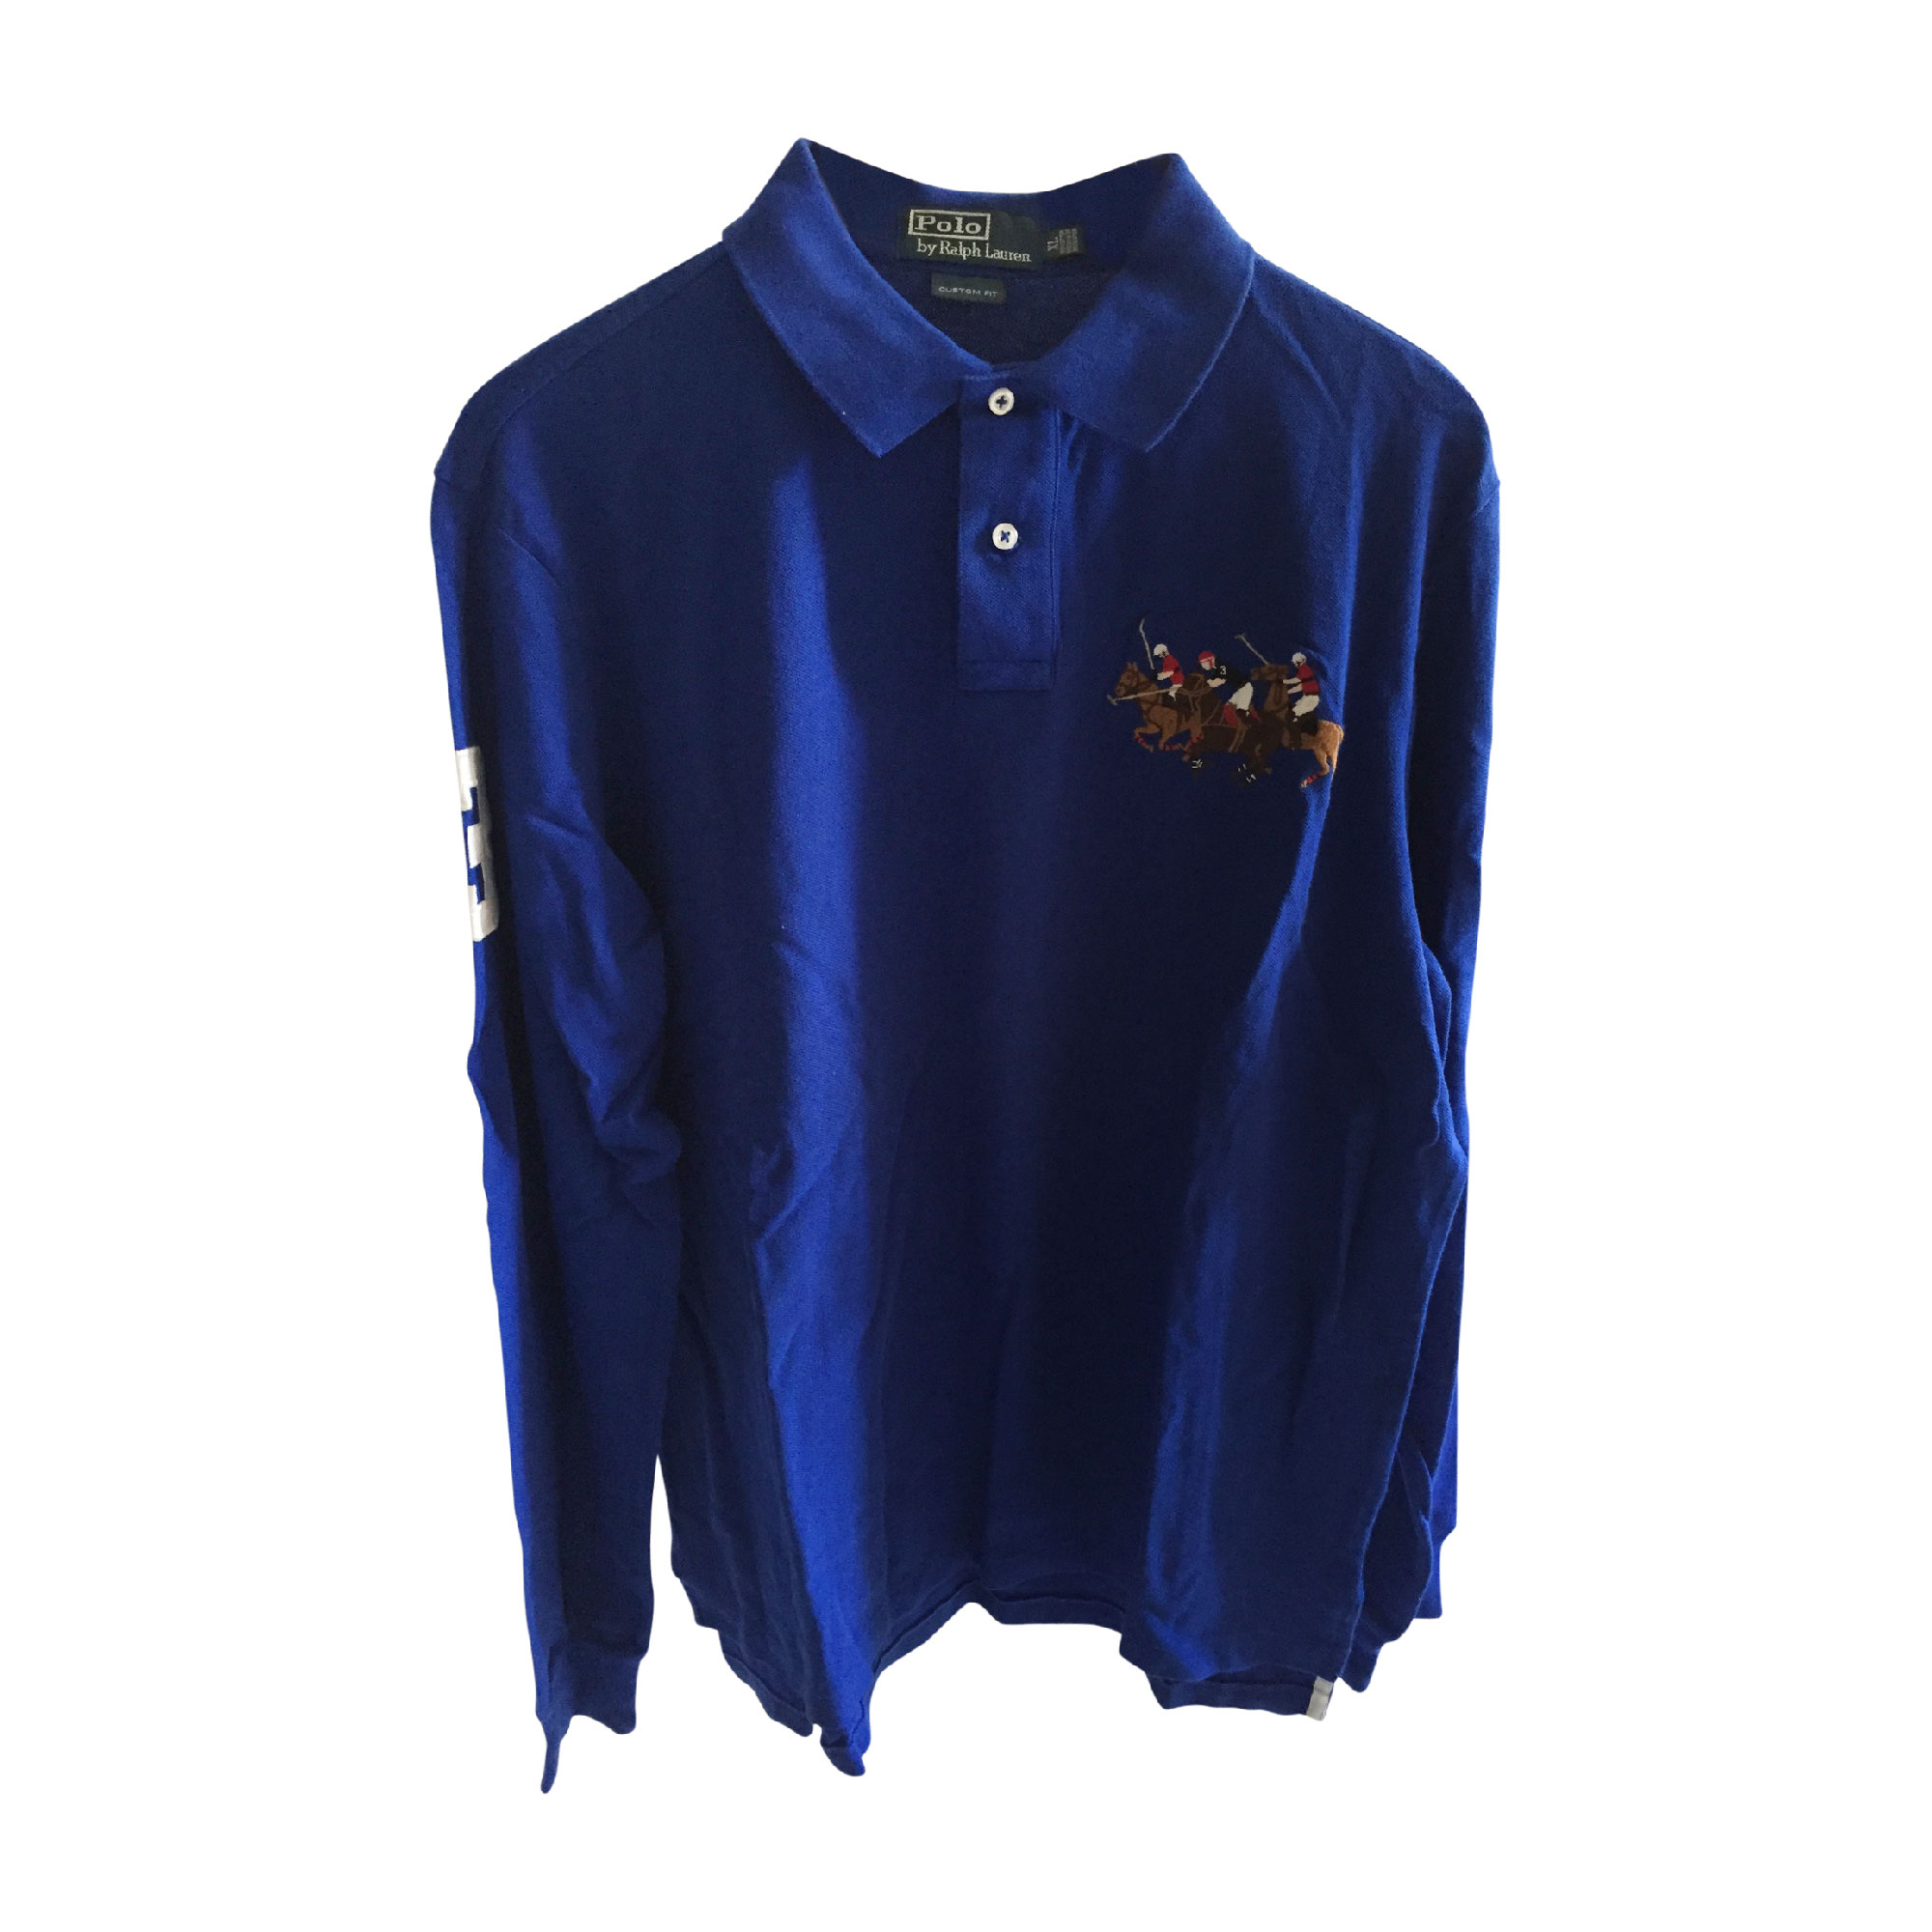 ed19c6489364 Polo RALPH LAUREN 4 (XL) bleu vendu par Bonbon julie - 7993439